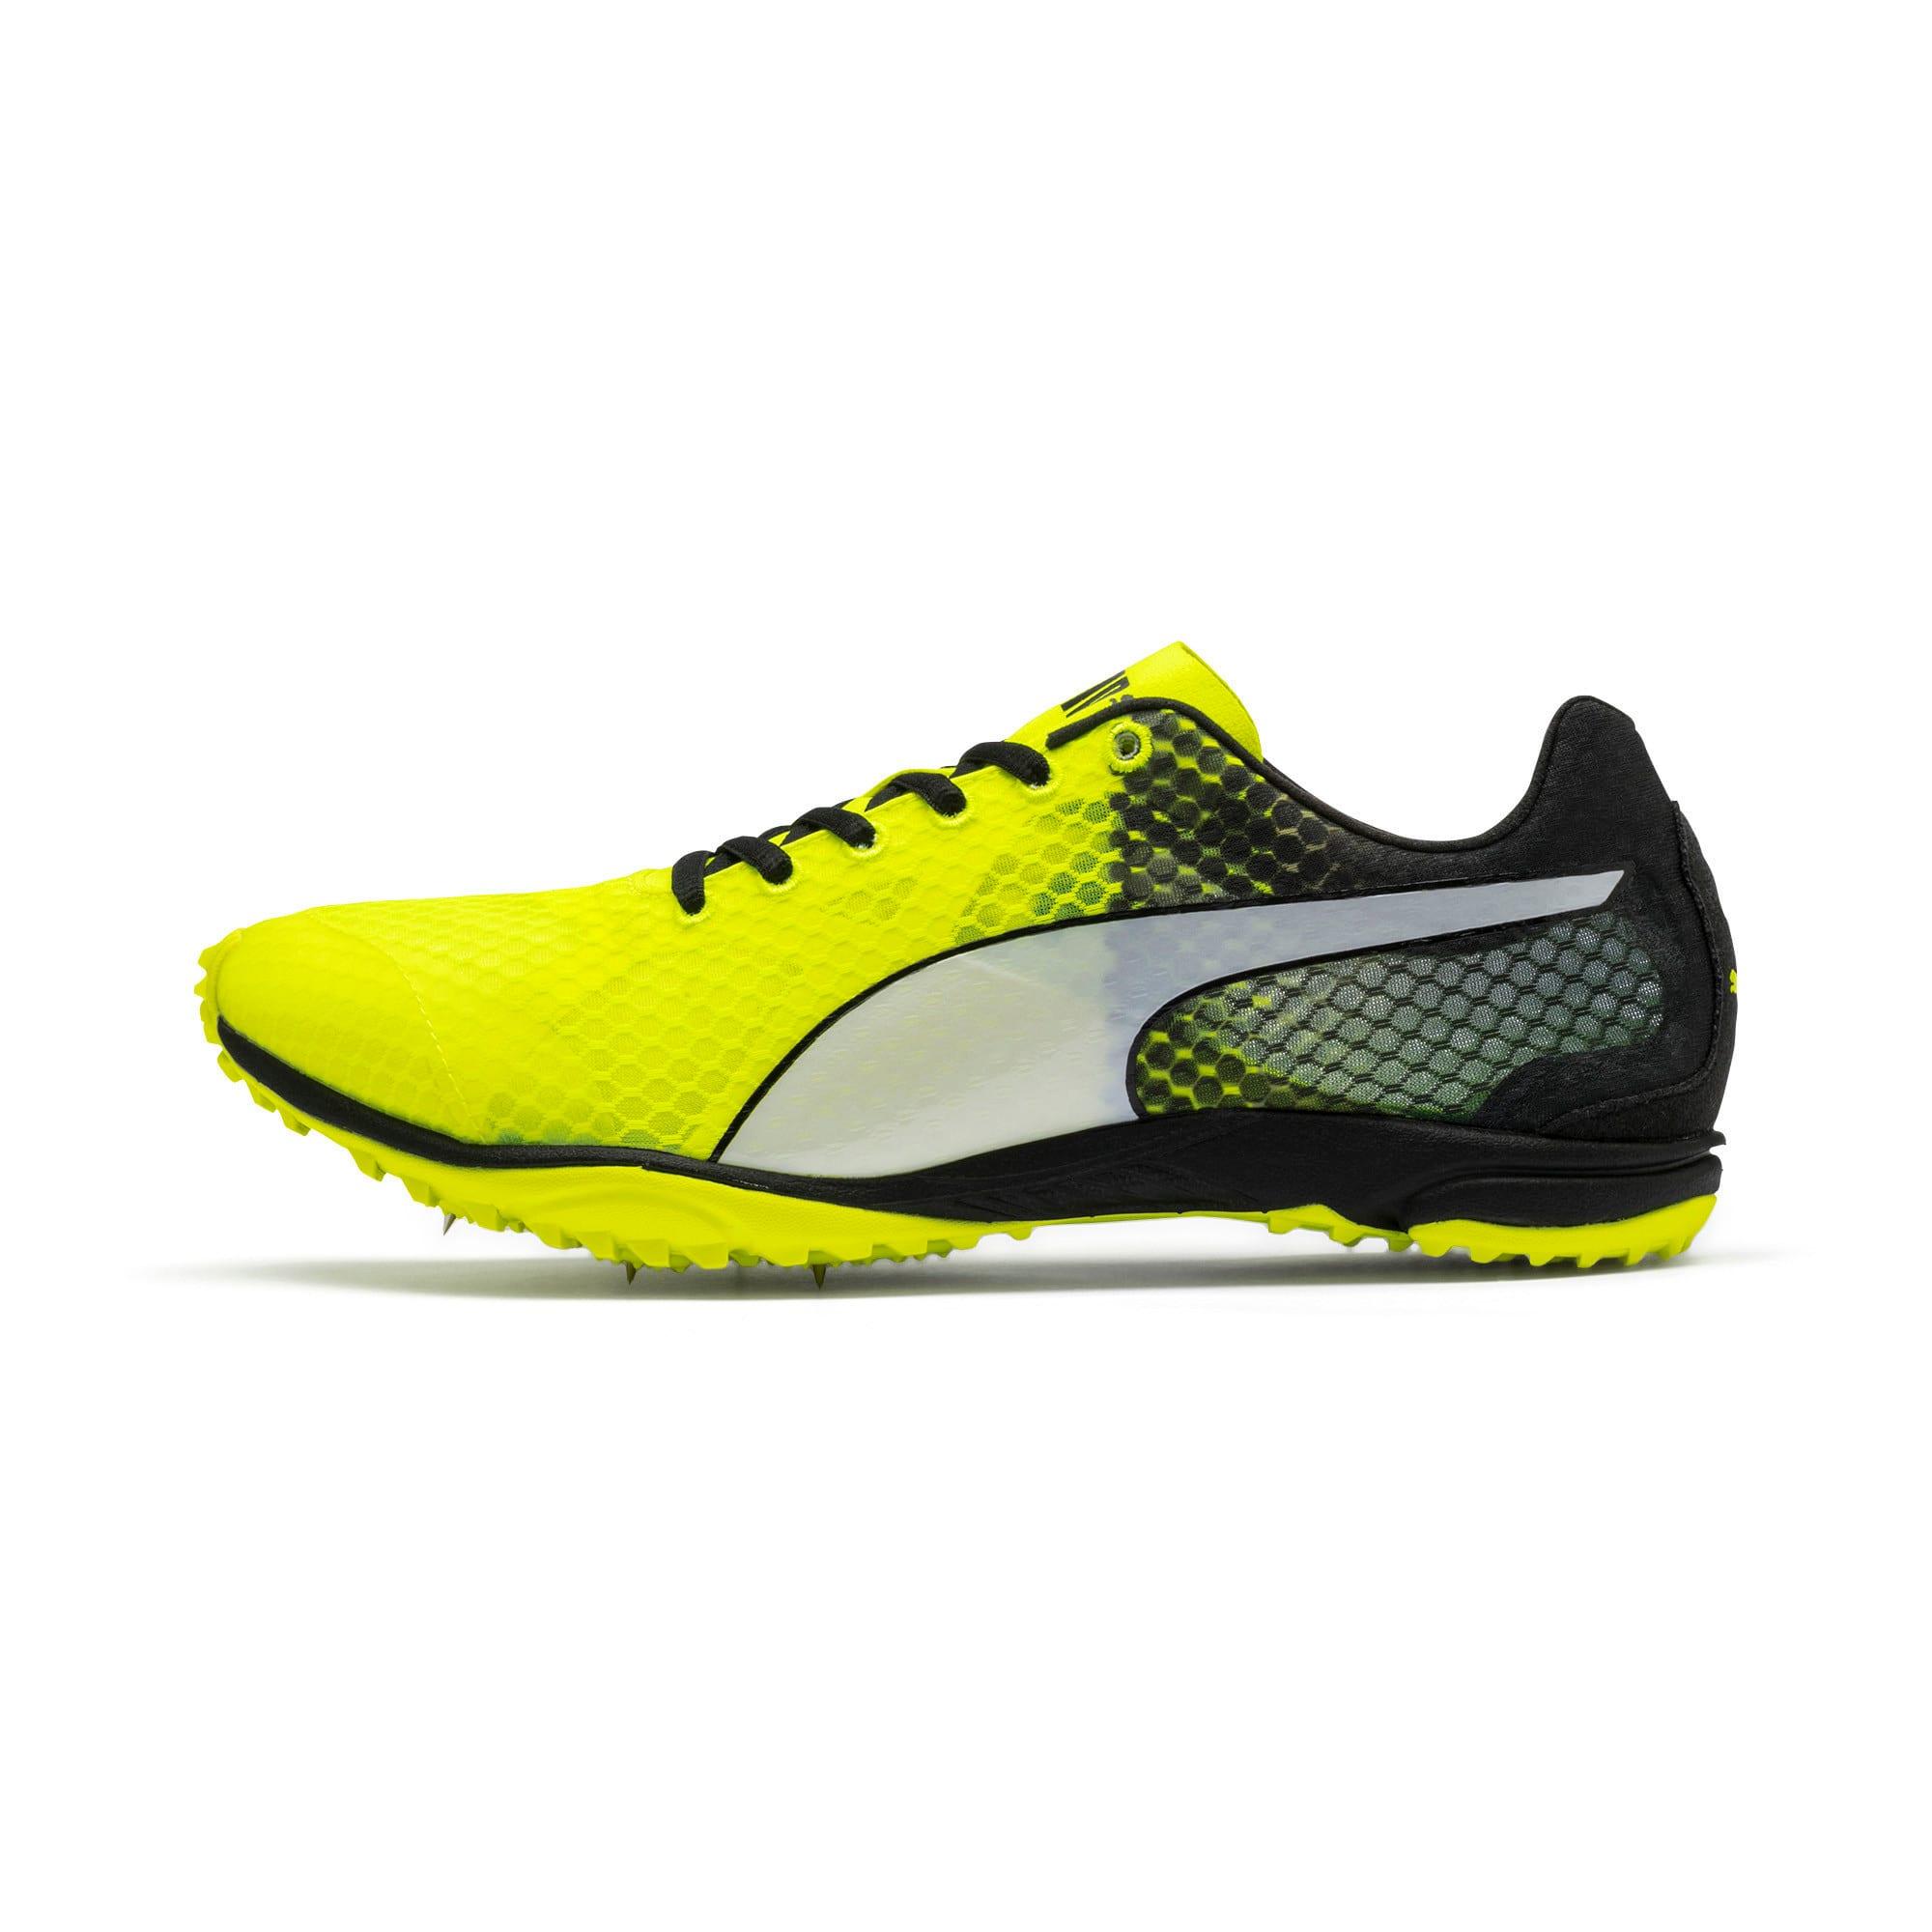 Thumbnail 1 of evoSPEED Haraka 6 Track and Field Boots, Yellow Alert-Black-White, medium-IND